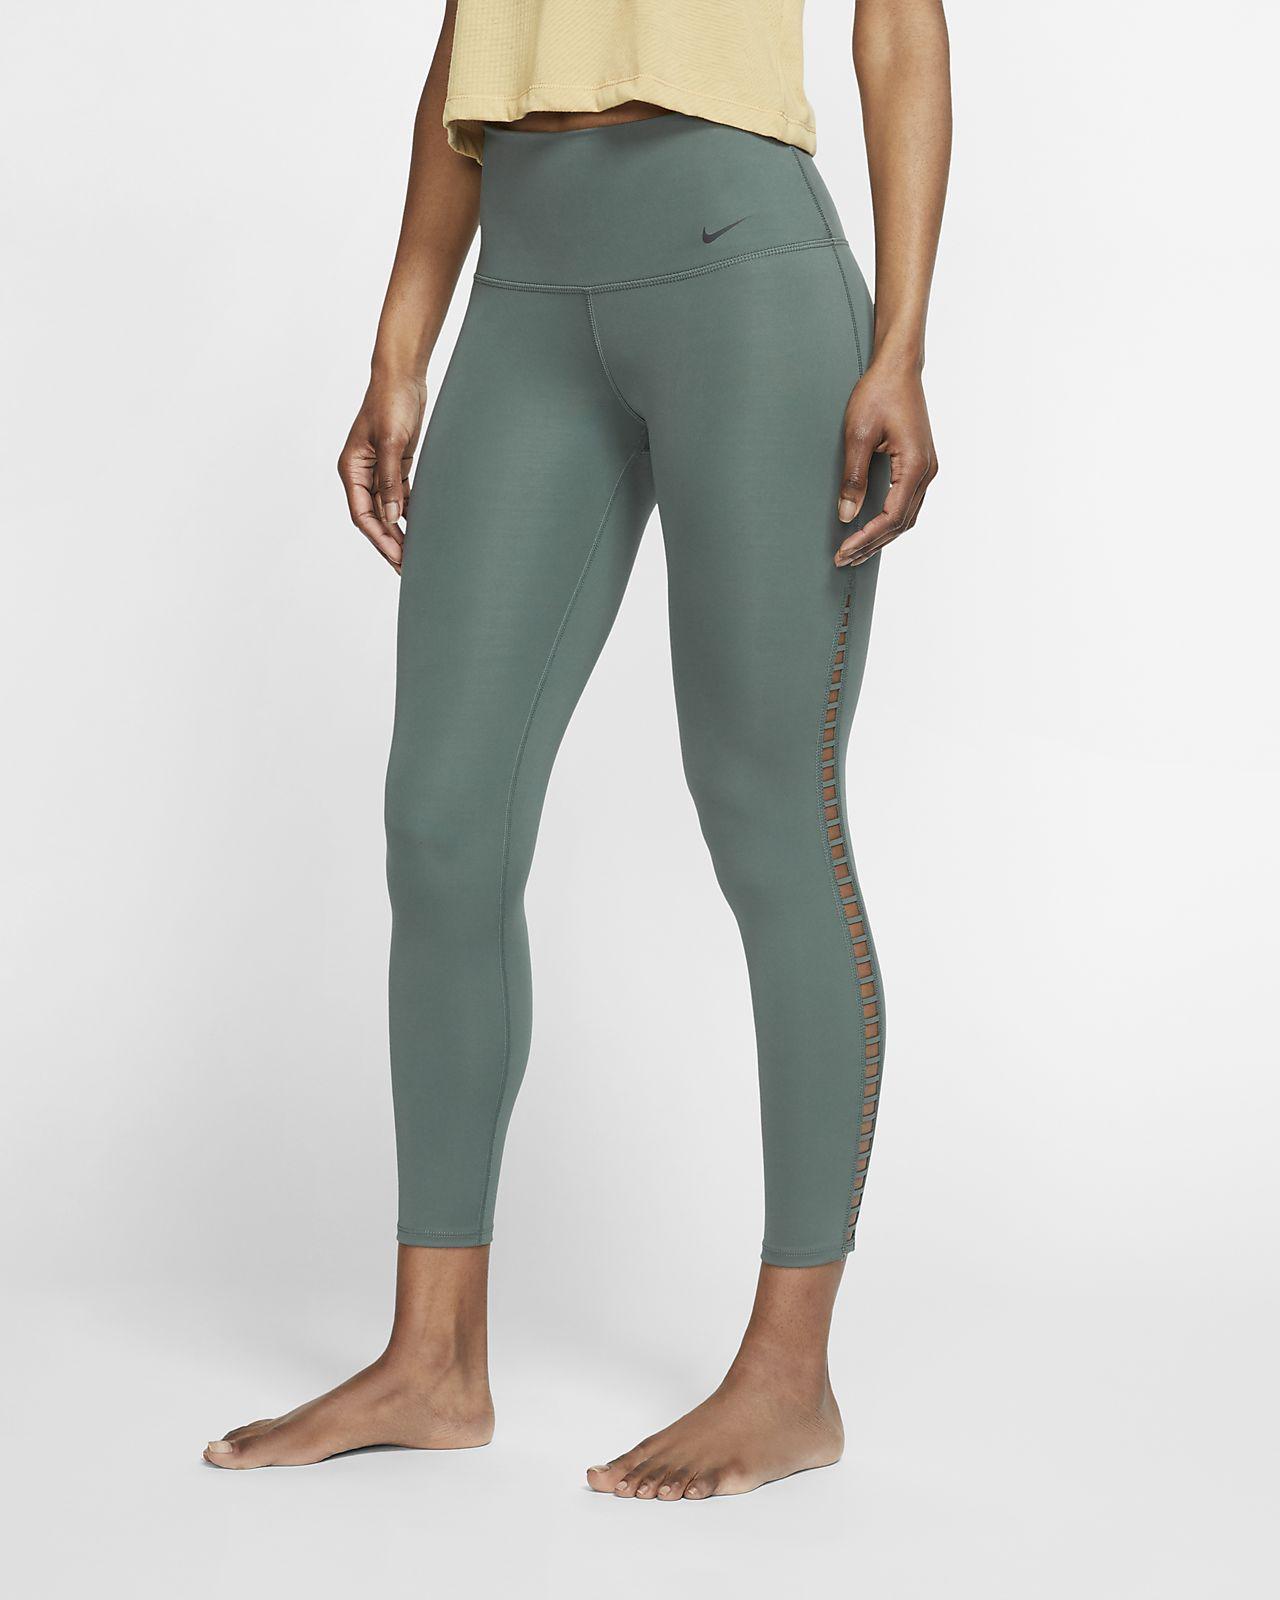 Nike Dri-FIT Power Women's 7/8 Yoga Training Tights